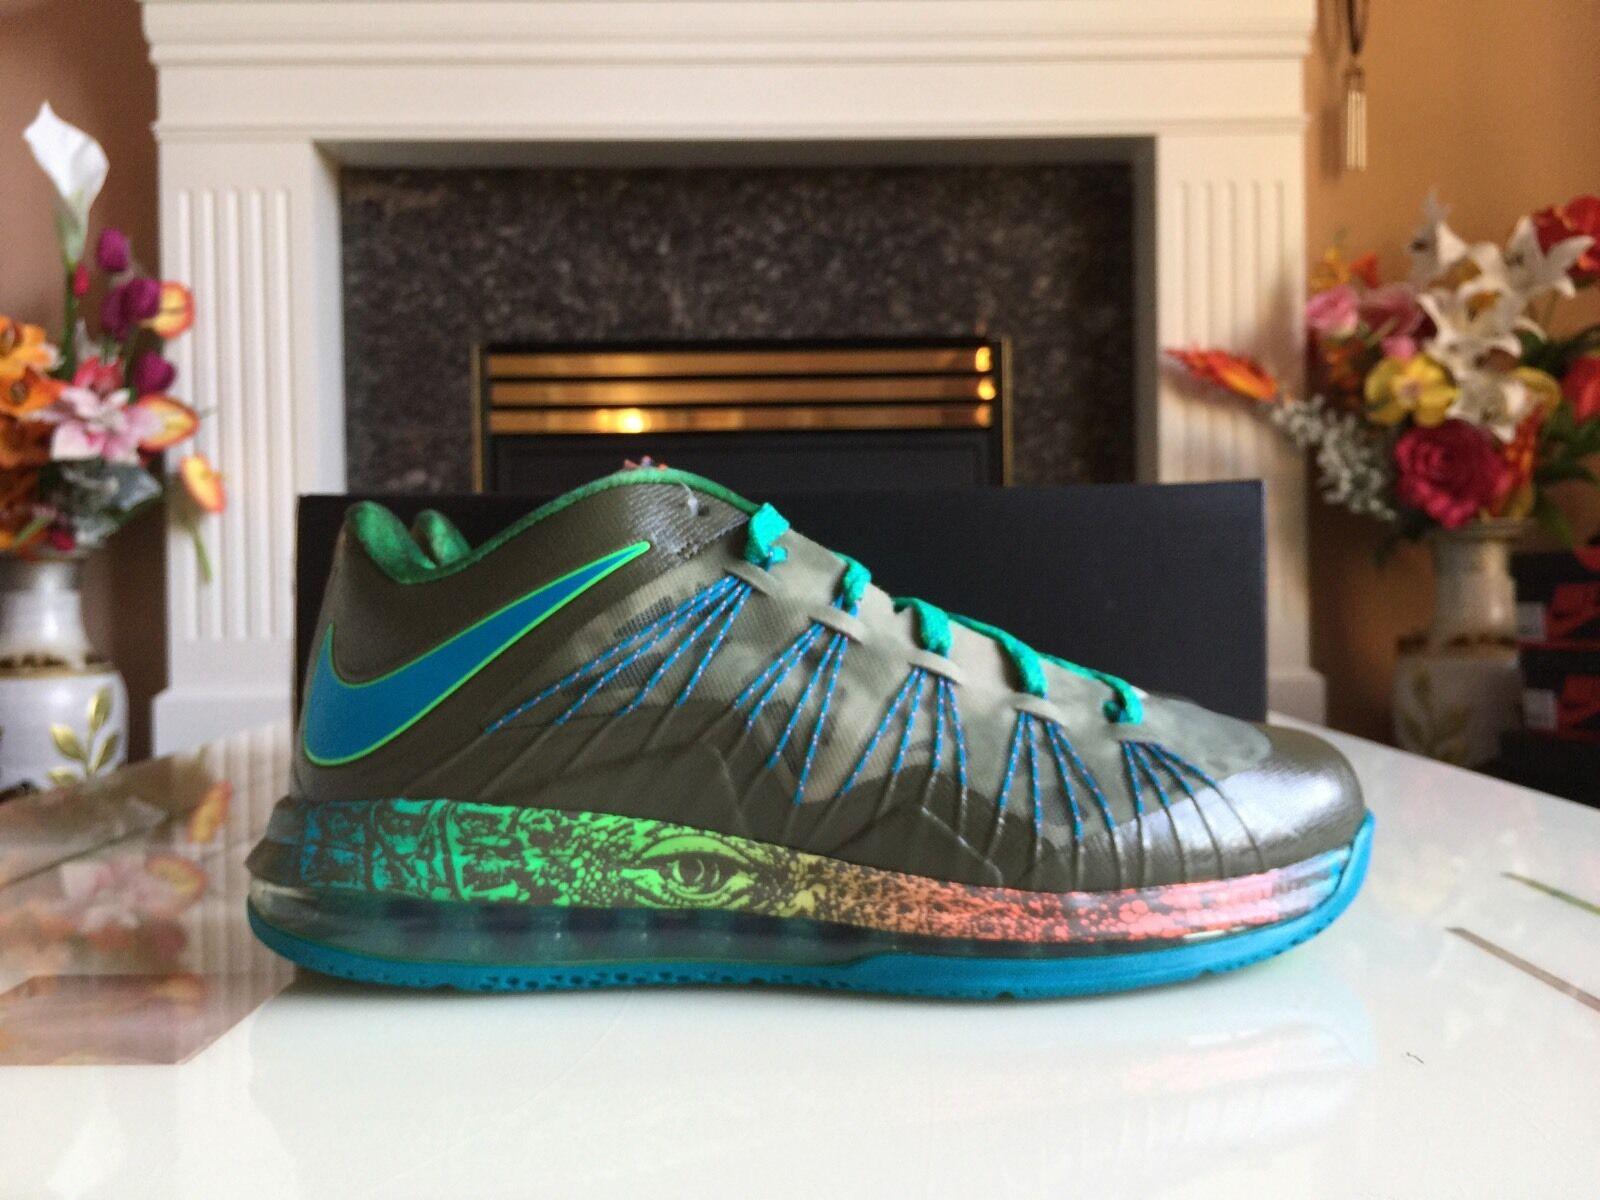 Nike LeBron x 10 bajo la cosa del pantano pantano pantano reptil comodo el modelo mas vendido de la marca 84a26b